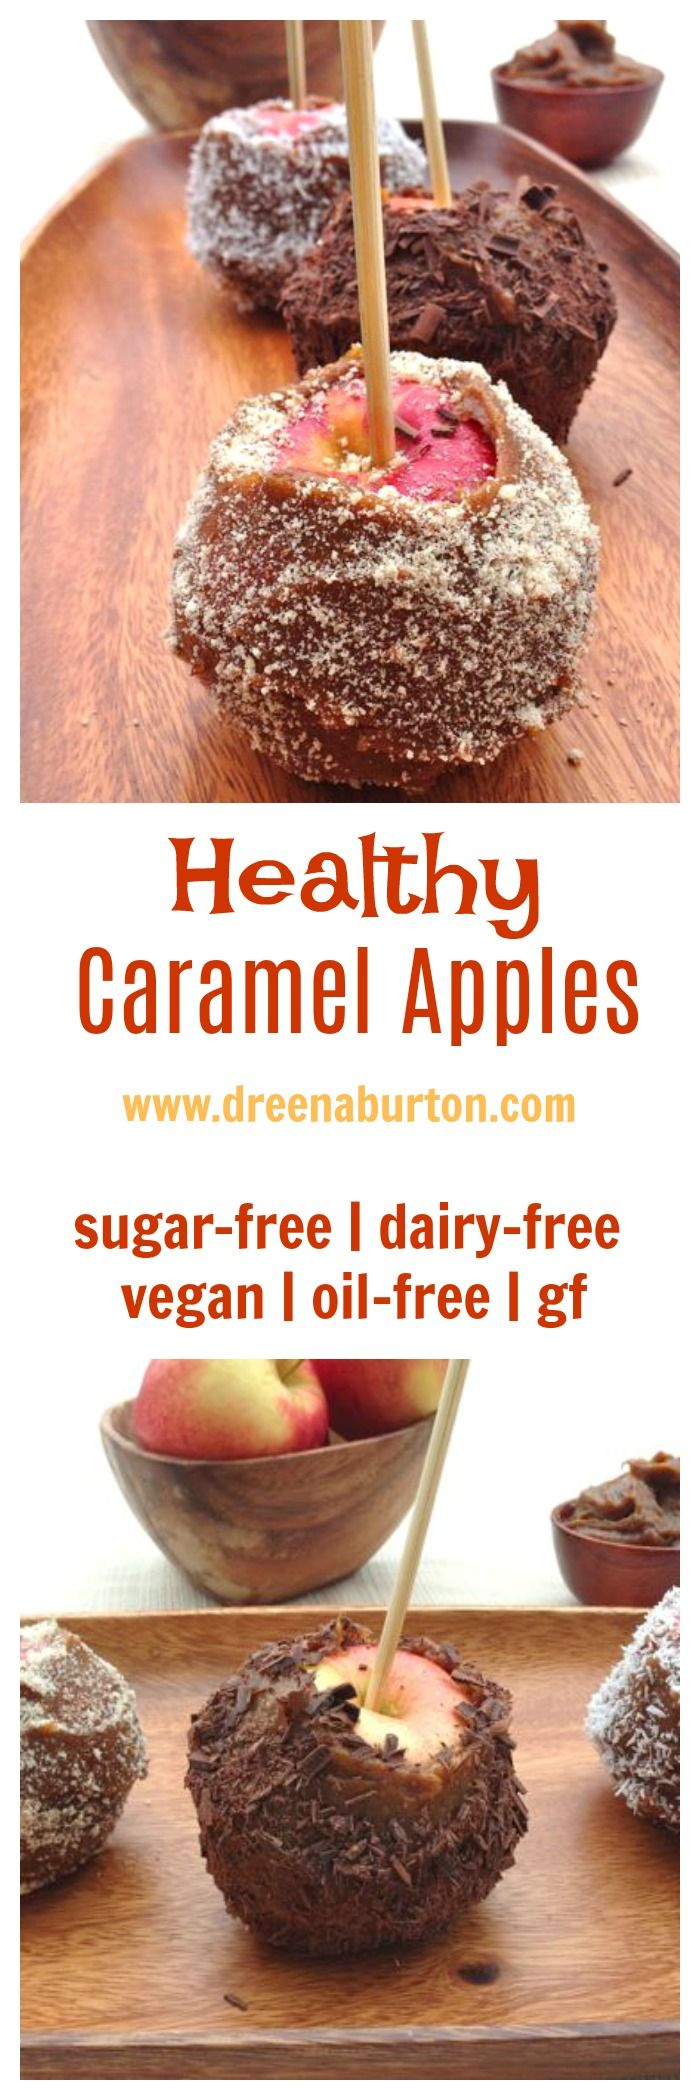 HEALTHY Caramel Apples! sugar-free, vegan, dairy-free, oil-free, gluten-free